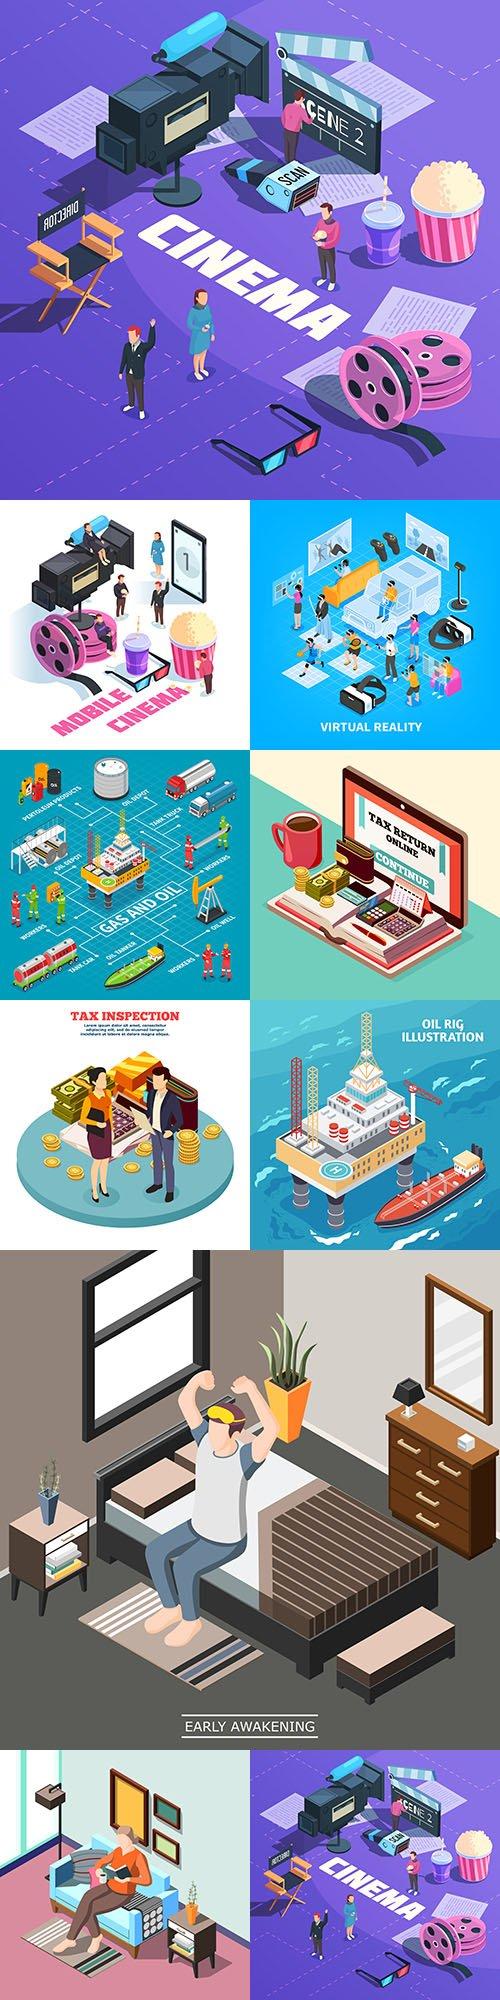 Isometrics flat business technology and people design 12